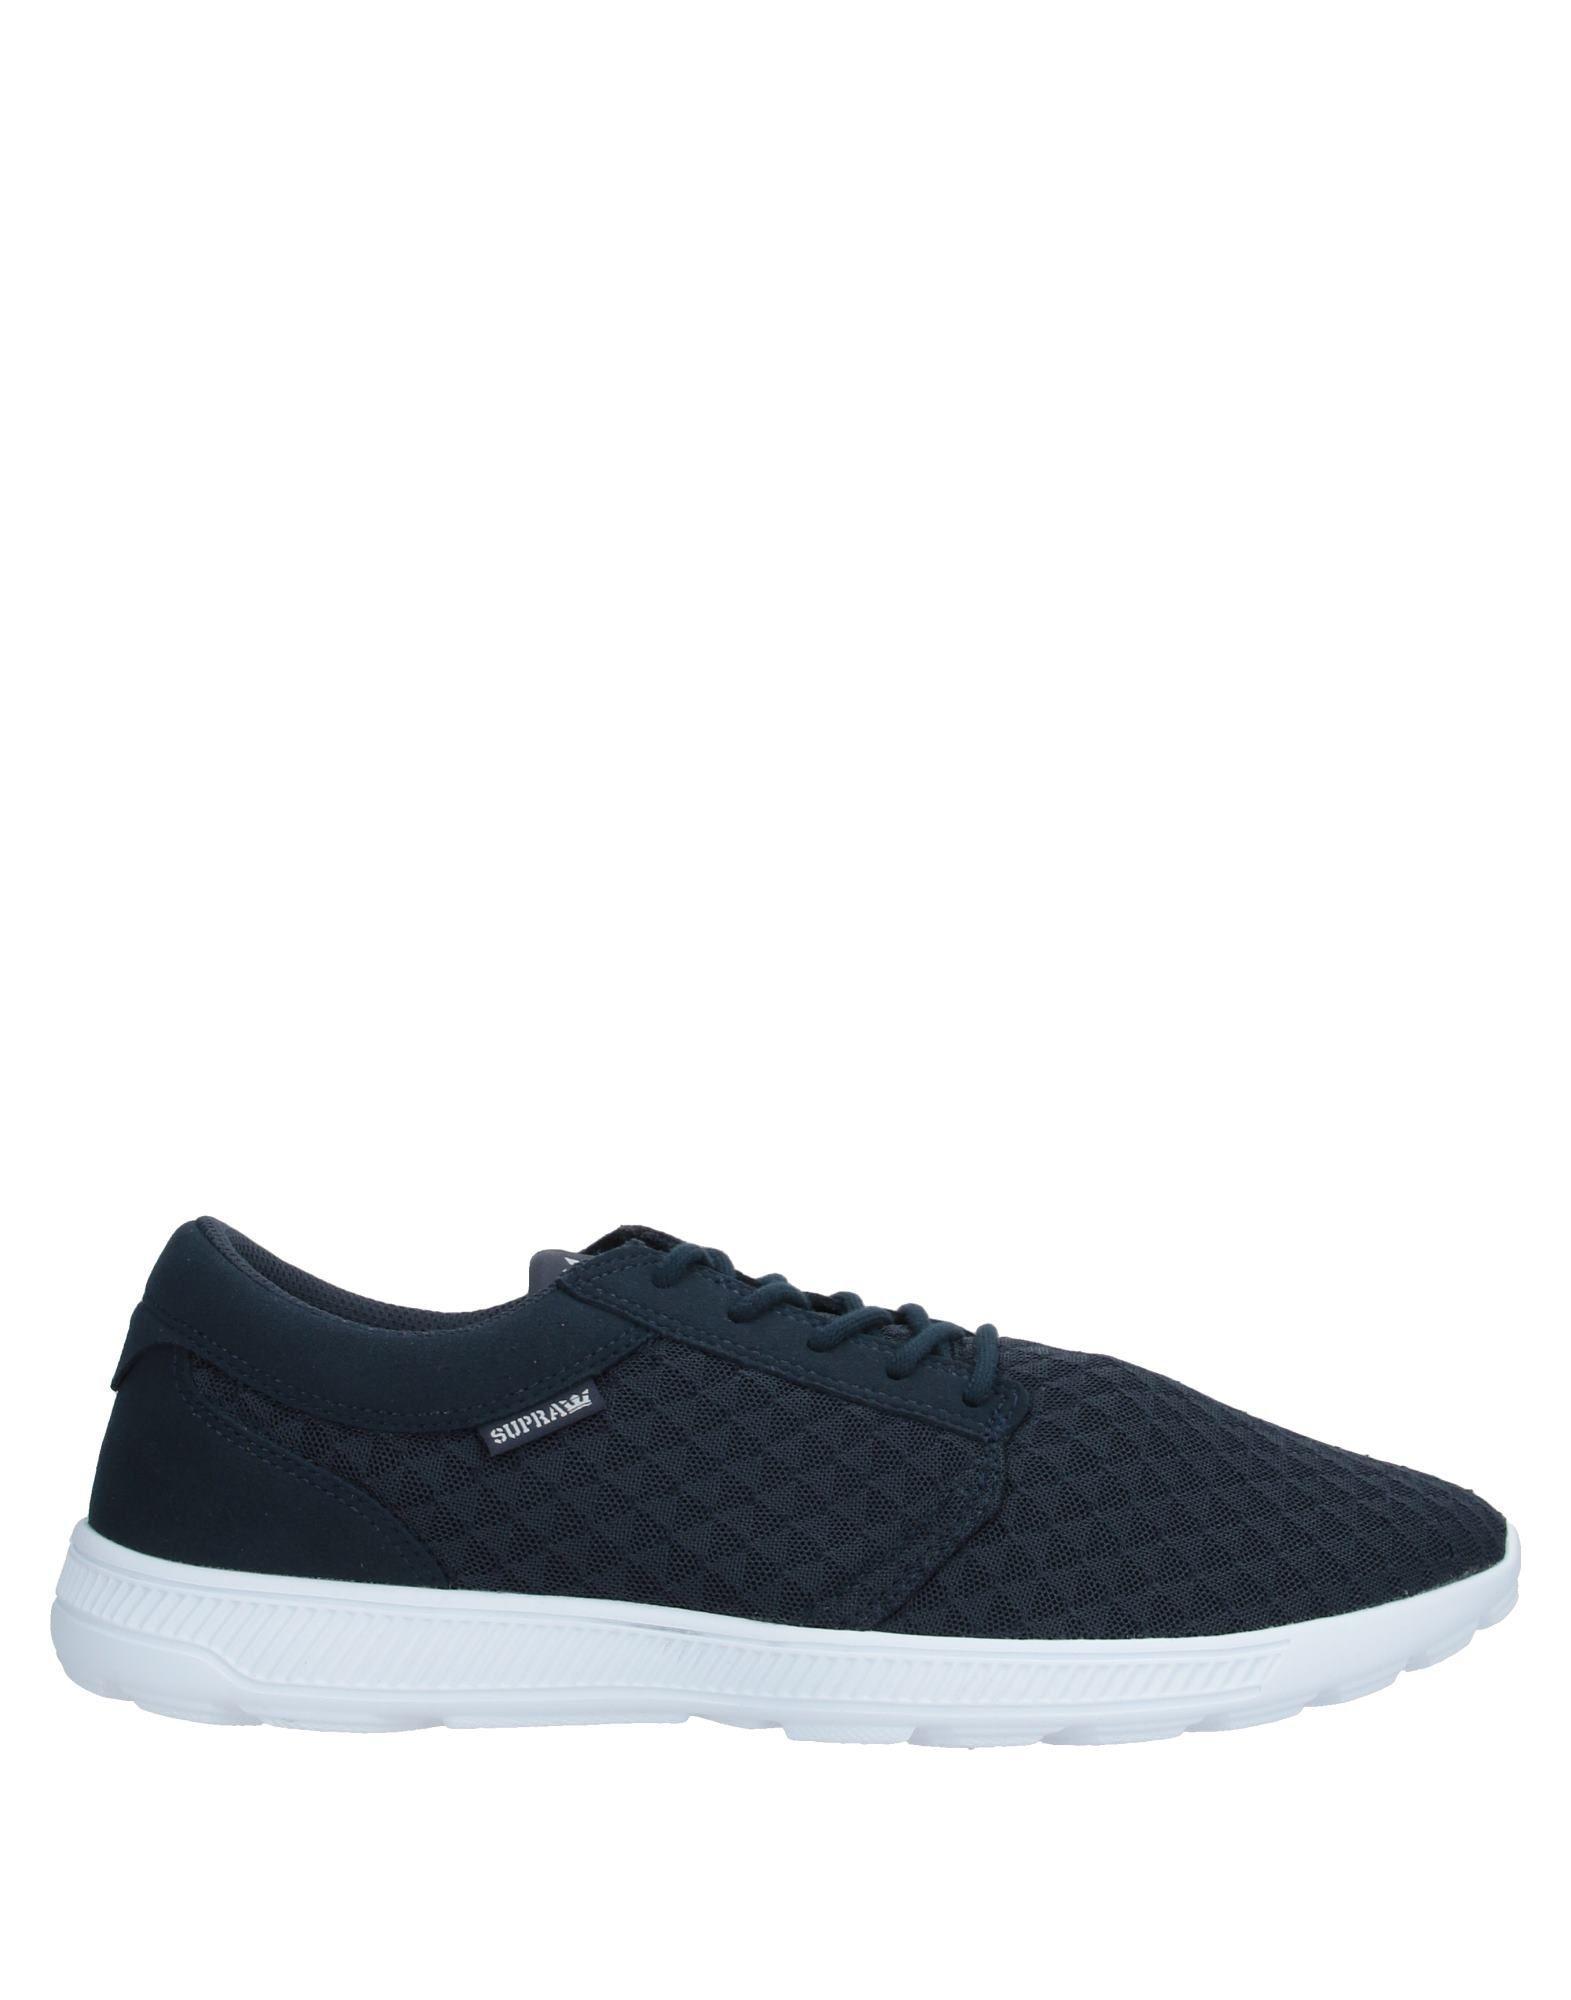 1a0dbc28ec Supra Low-tops & Sneakers in Blue for Men - Lyst